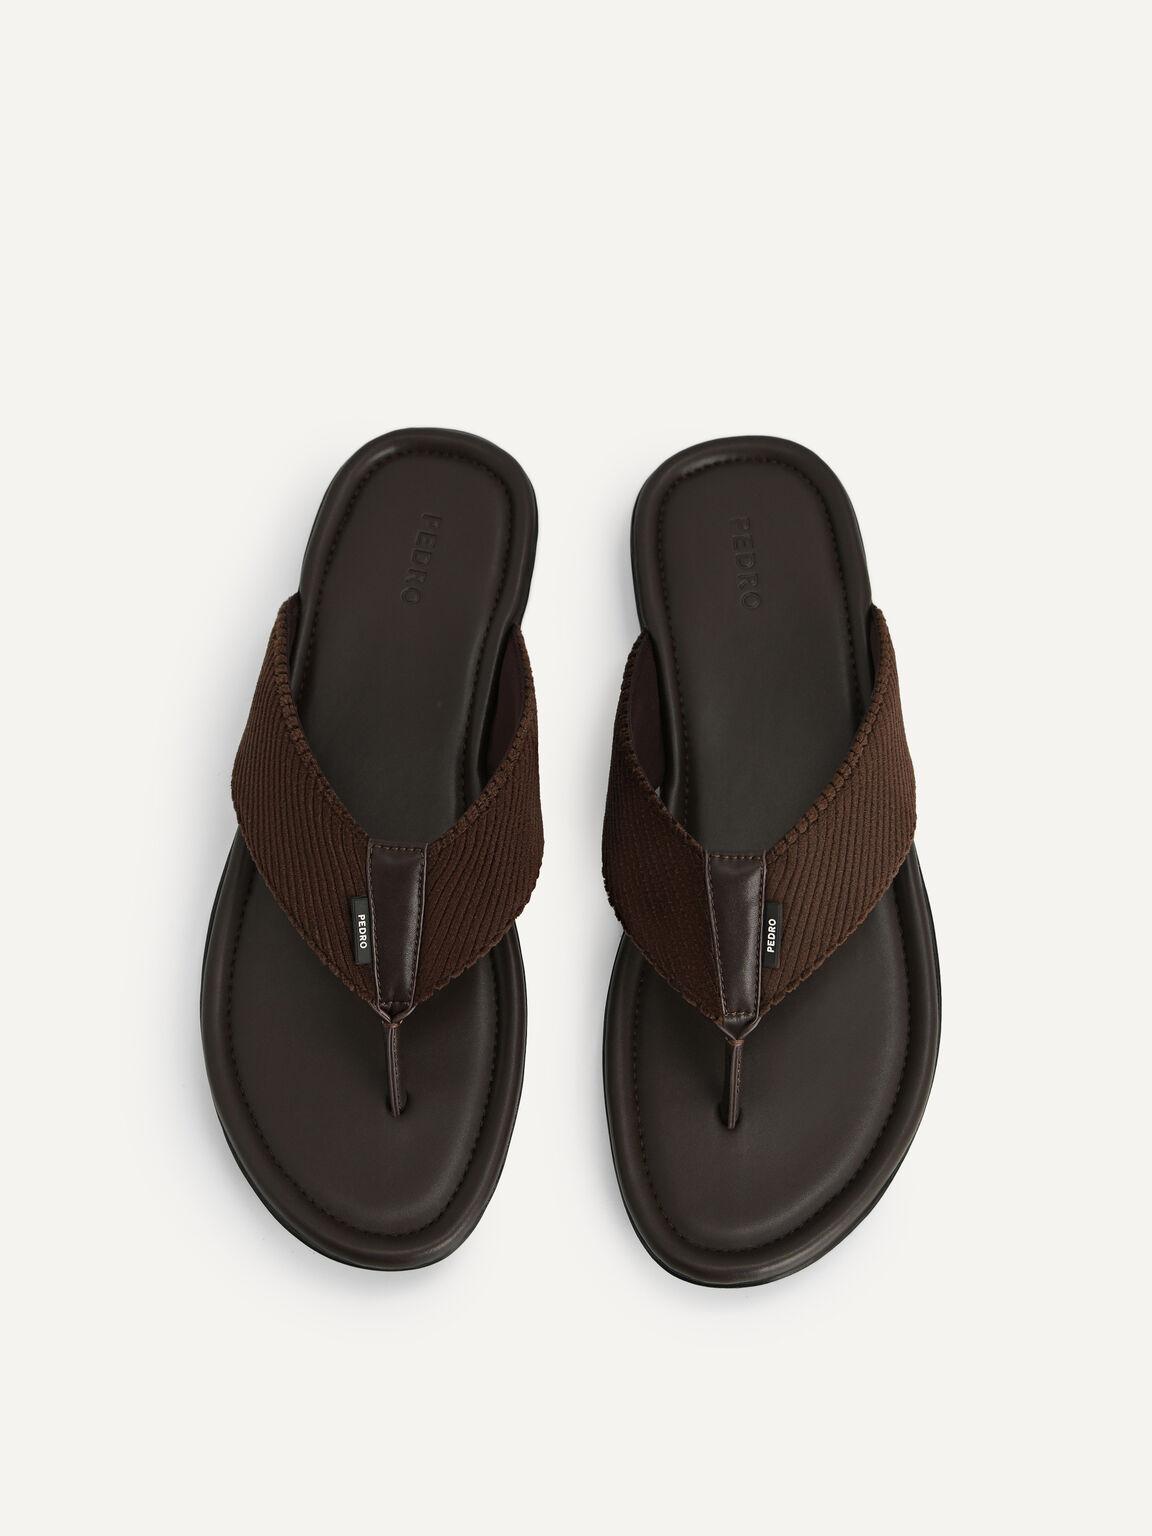 Corduroy Thong Sandals, Dark Brown, hi-res